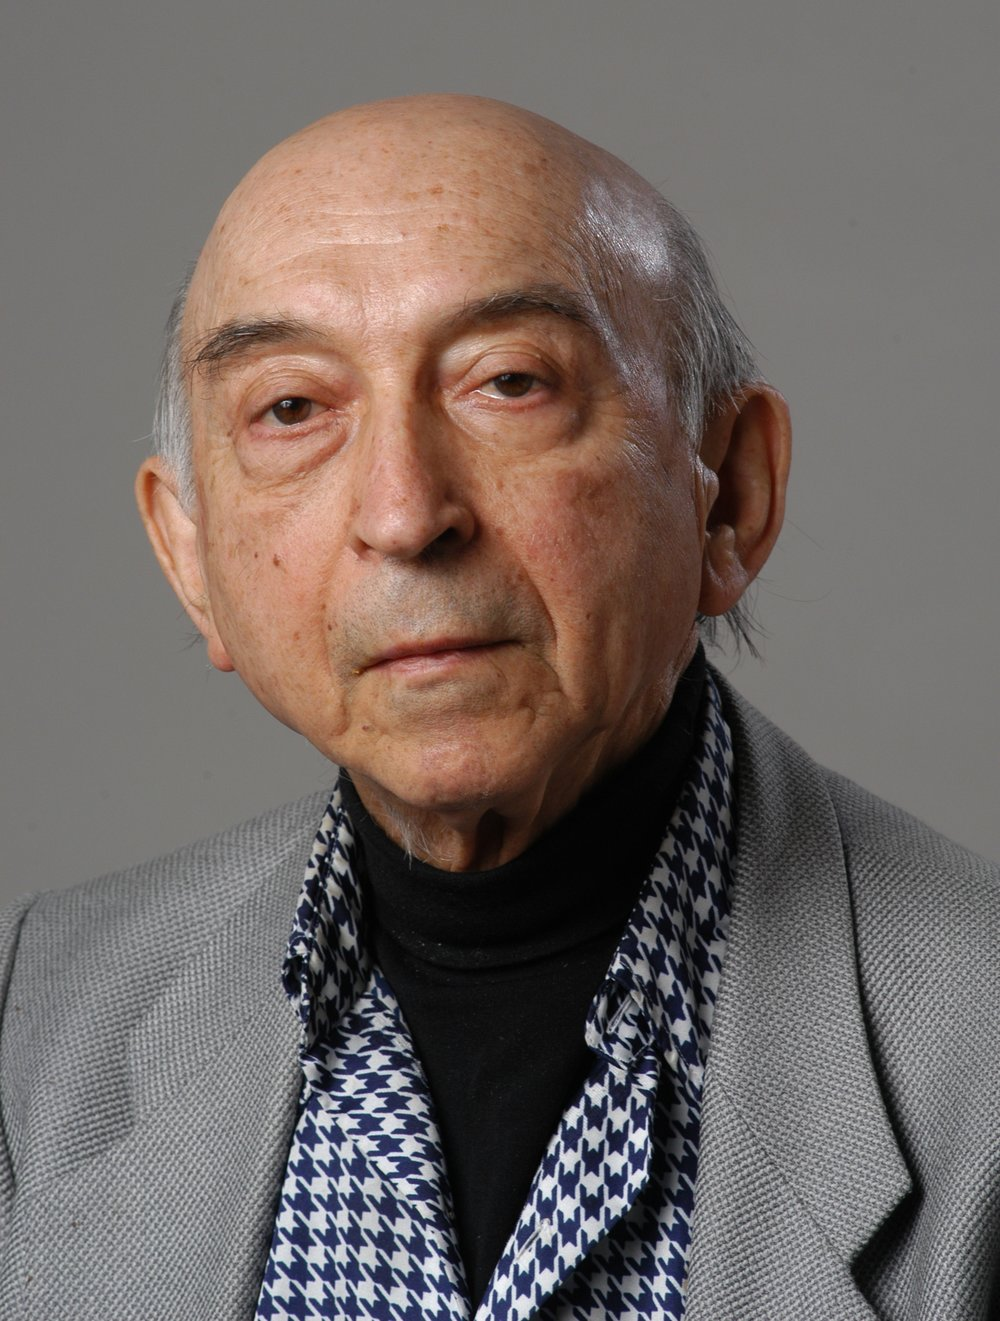 Lotfi A. Zadeh